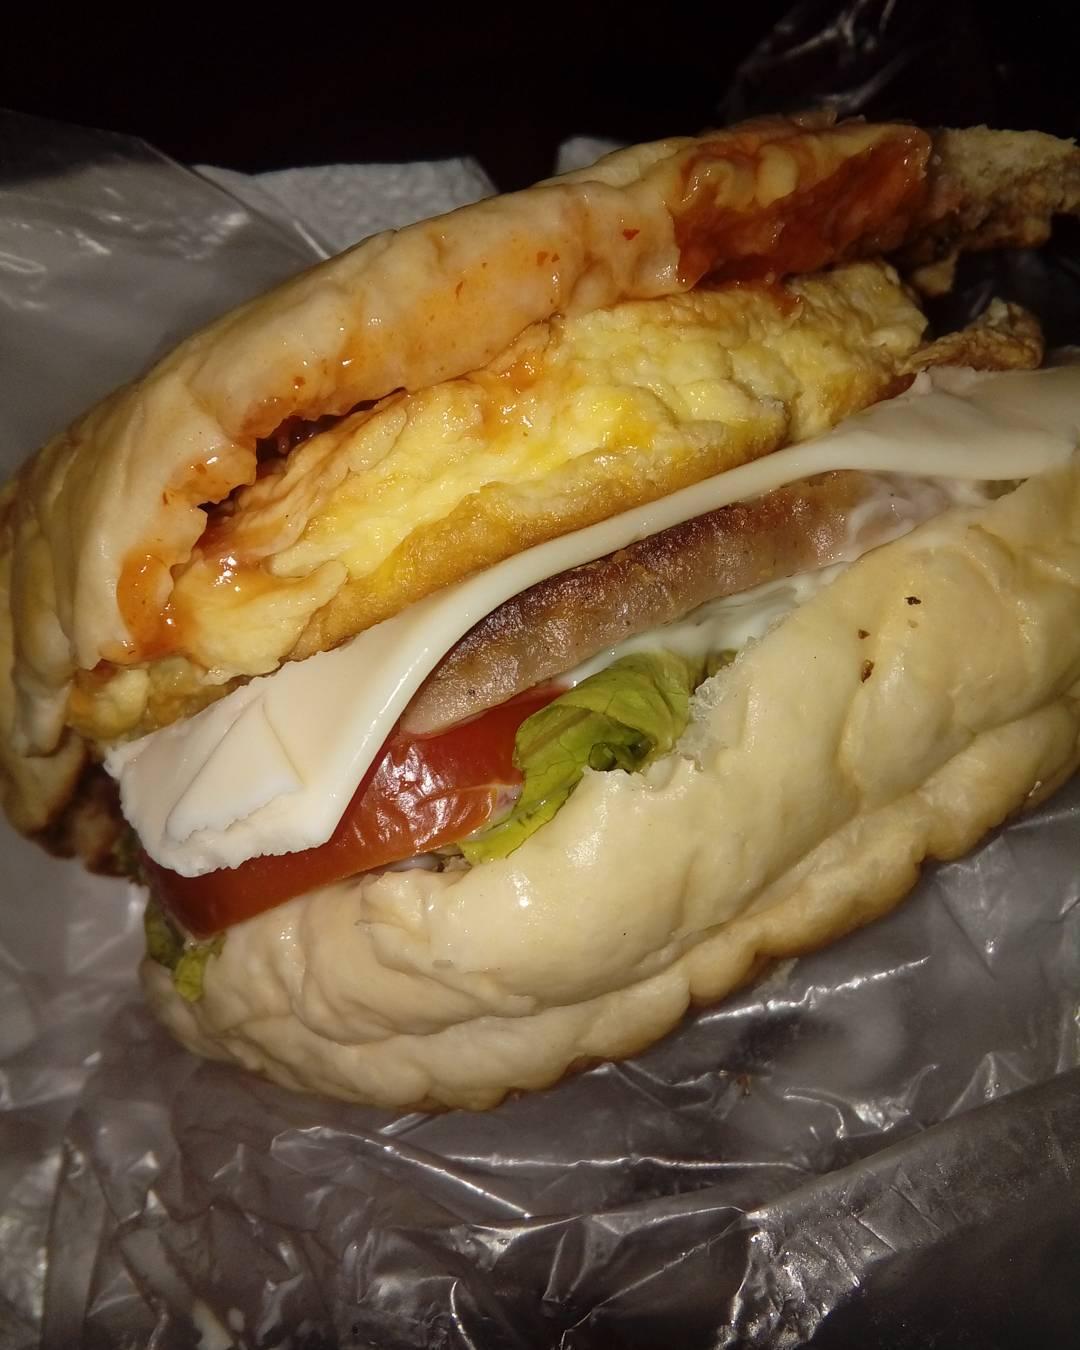 Burger Dennys, Burger Dennys Malang, Malang, Kota Malang, Dolan Dolen, Dolaners Burger Dennys via burgerdennys - Dolan Dolen